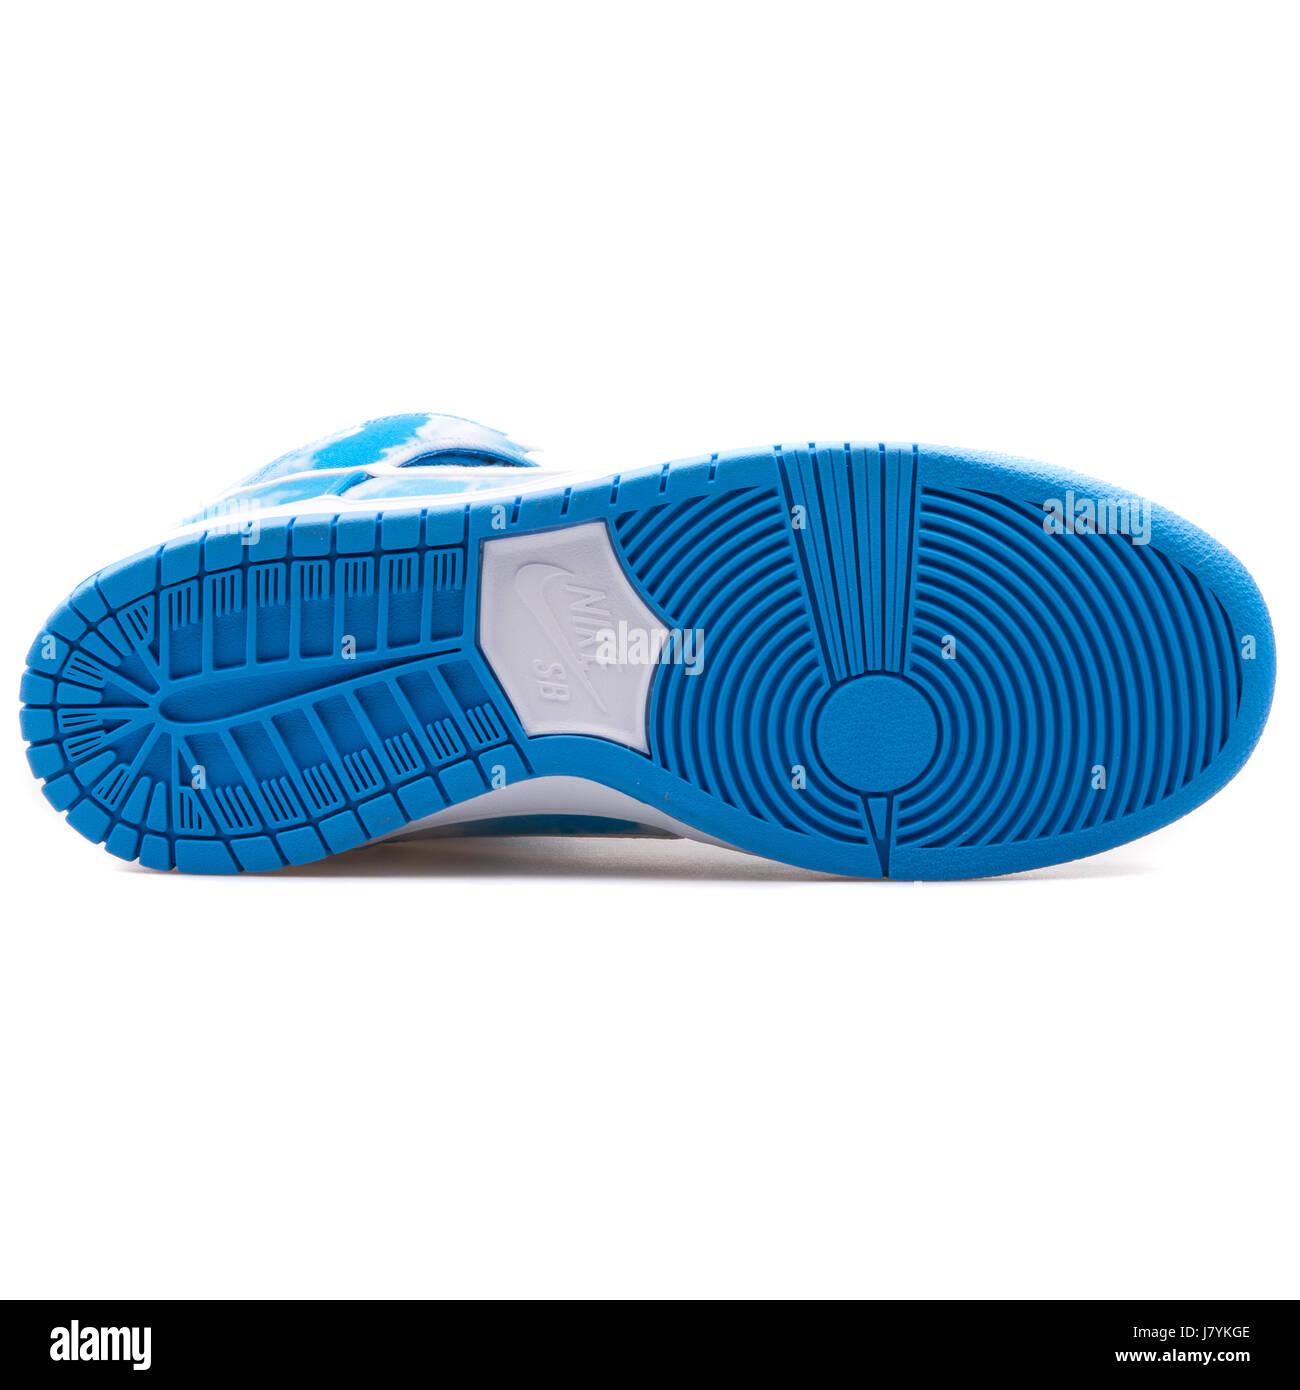 finest selection e4349 c62c5 Nike Dunk High Pro SB Clouds Blue Pattern - 305050-414 - Stock Image